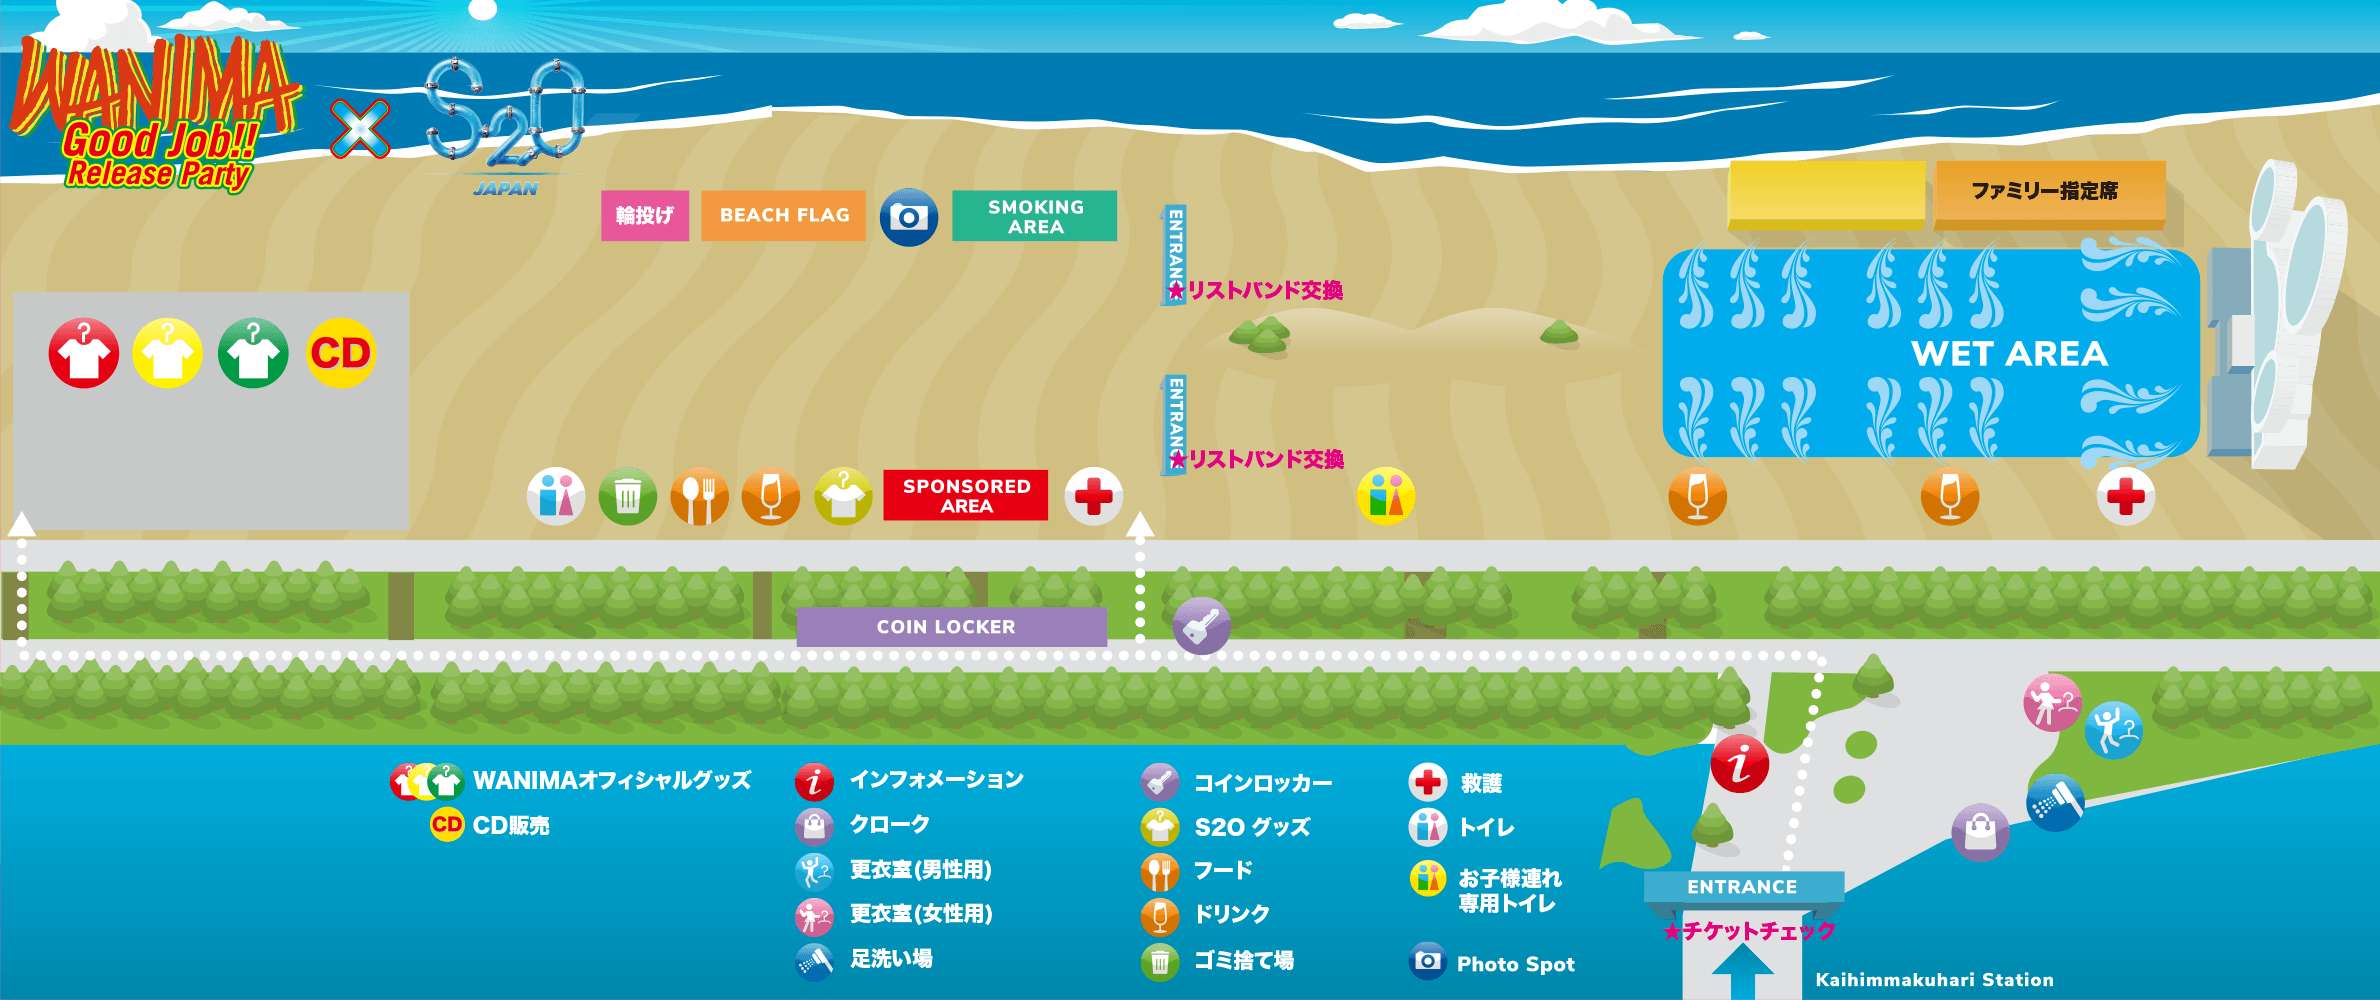 S2Oエリアマップ